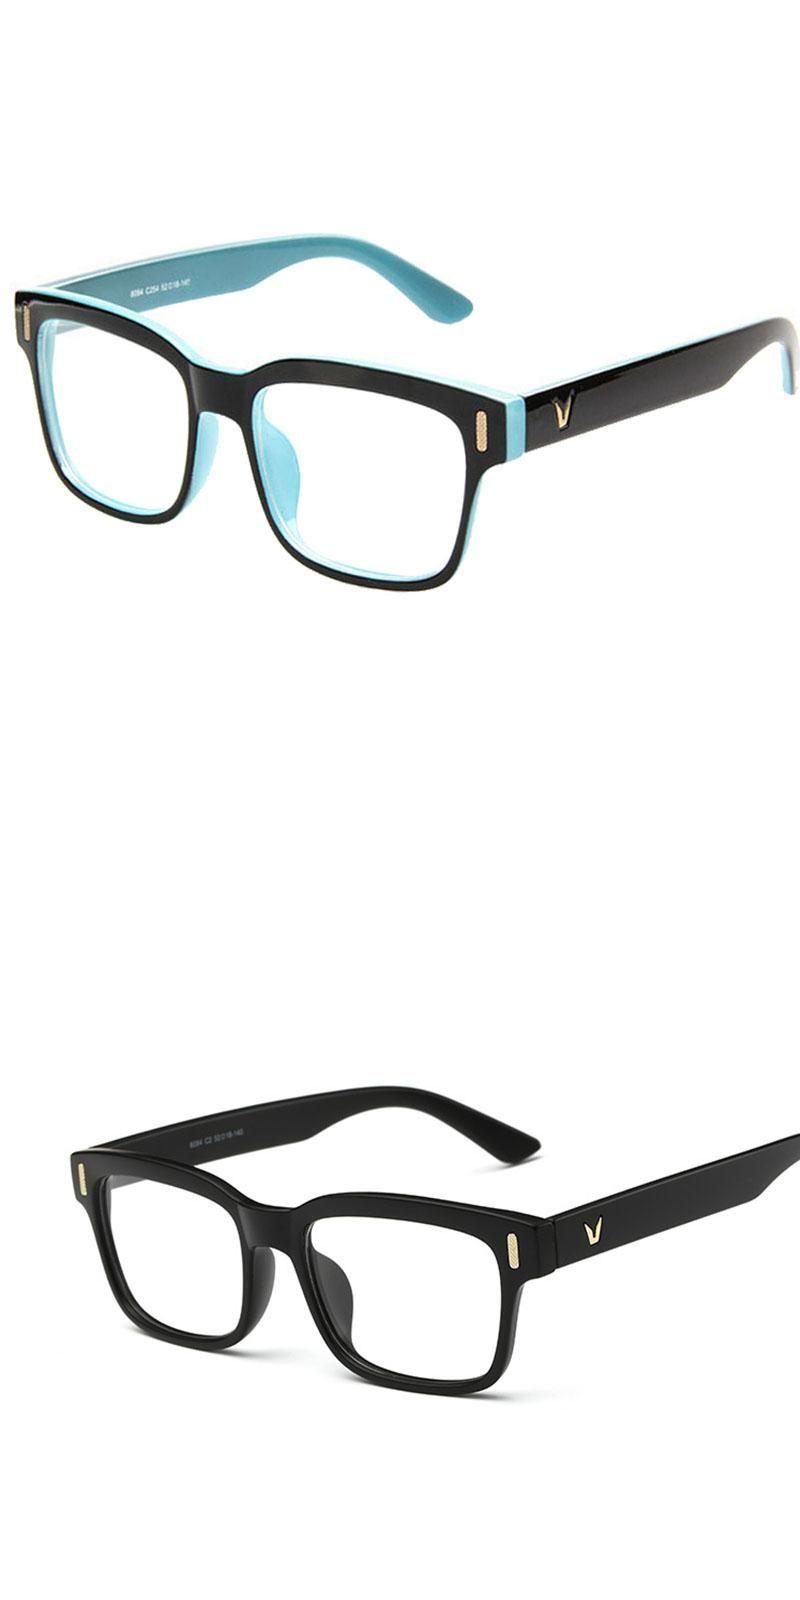 c3a340f6efe Newv shaped box eyeglasses frame brand for women fashion men optical eye  glasses frame eyewear jpg